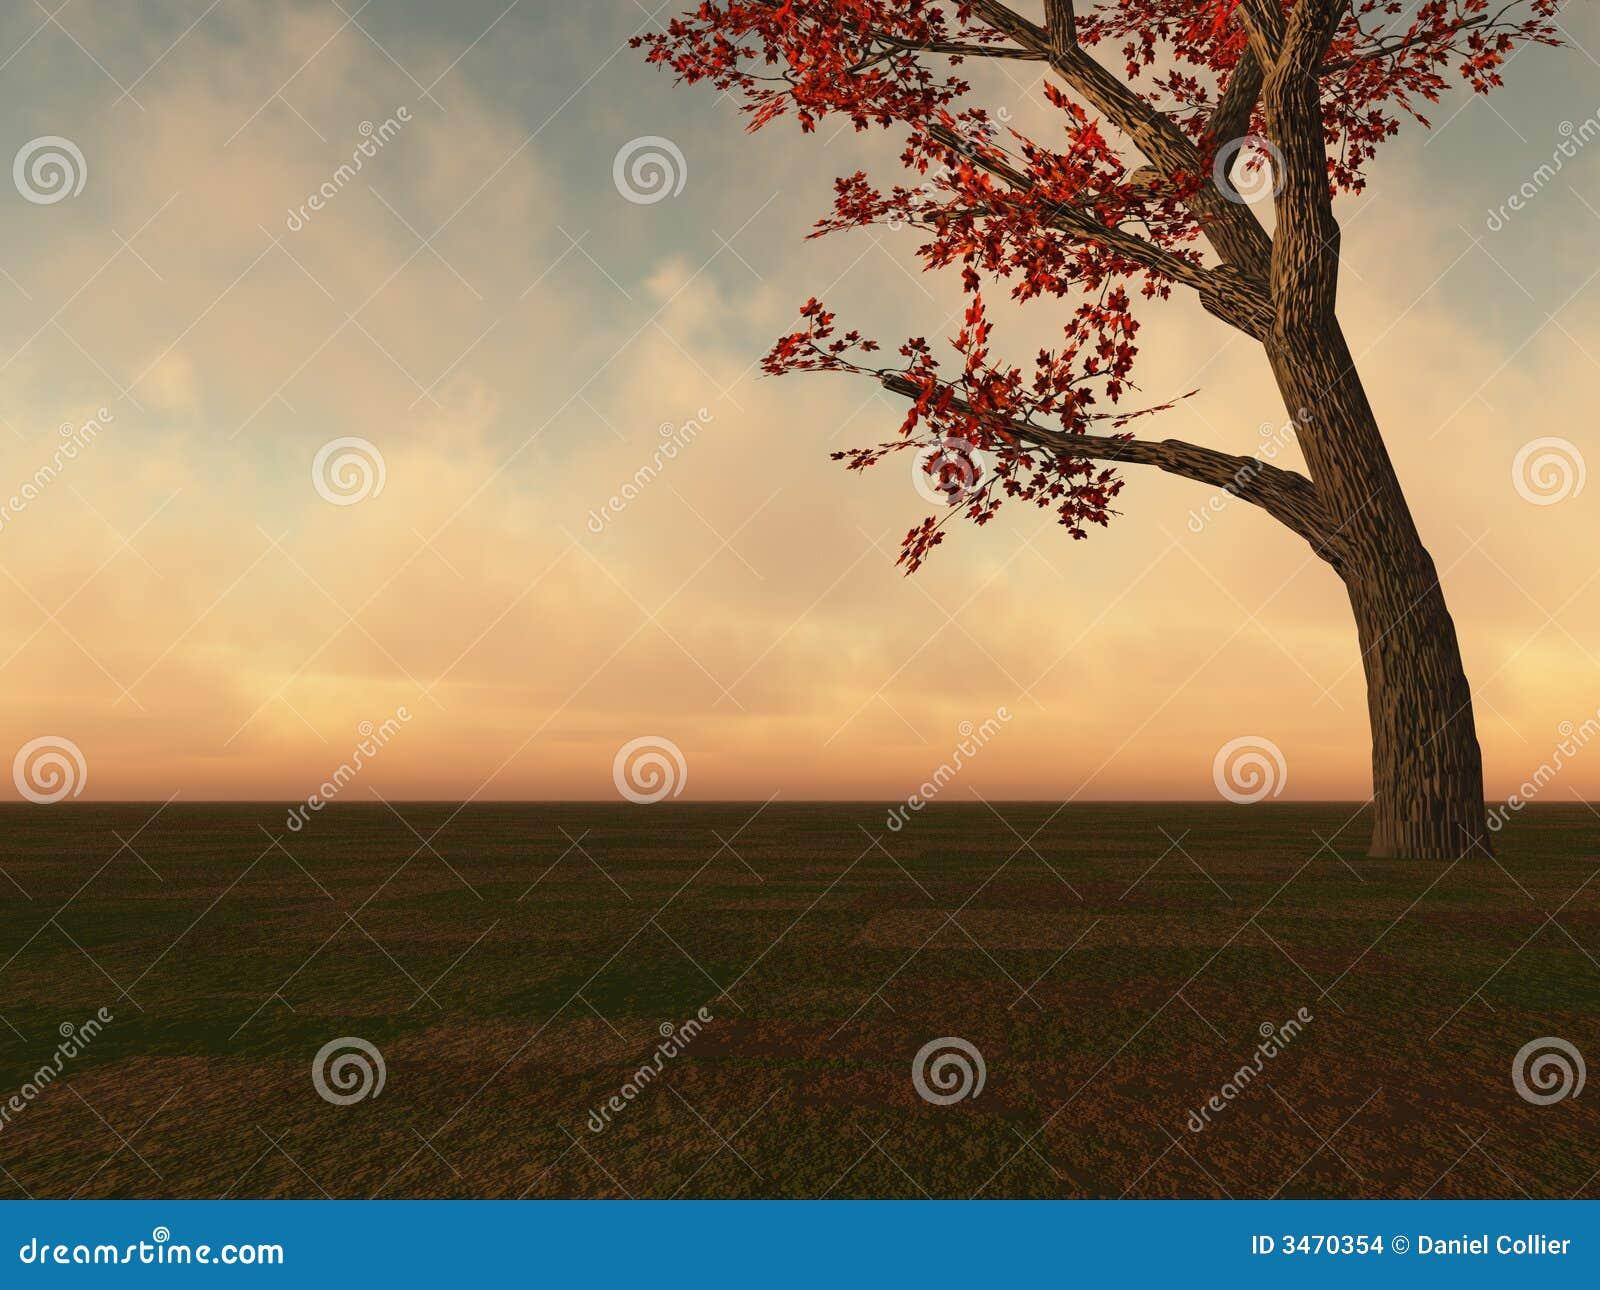 Fall Maple Tree On Horizon Stock Images Image 3470354